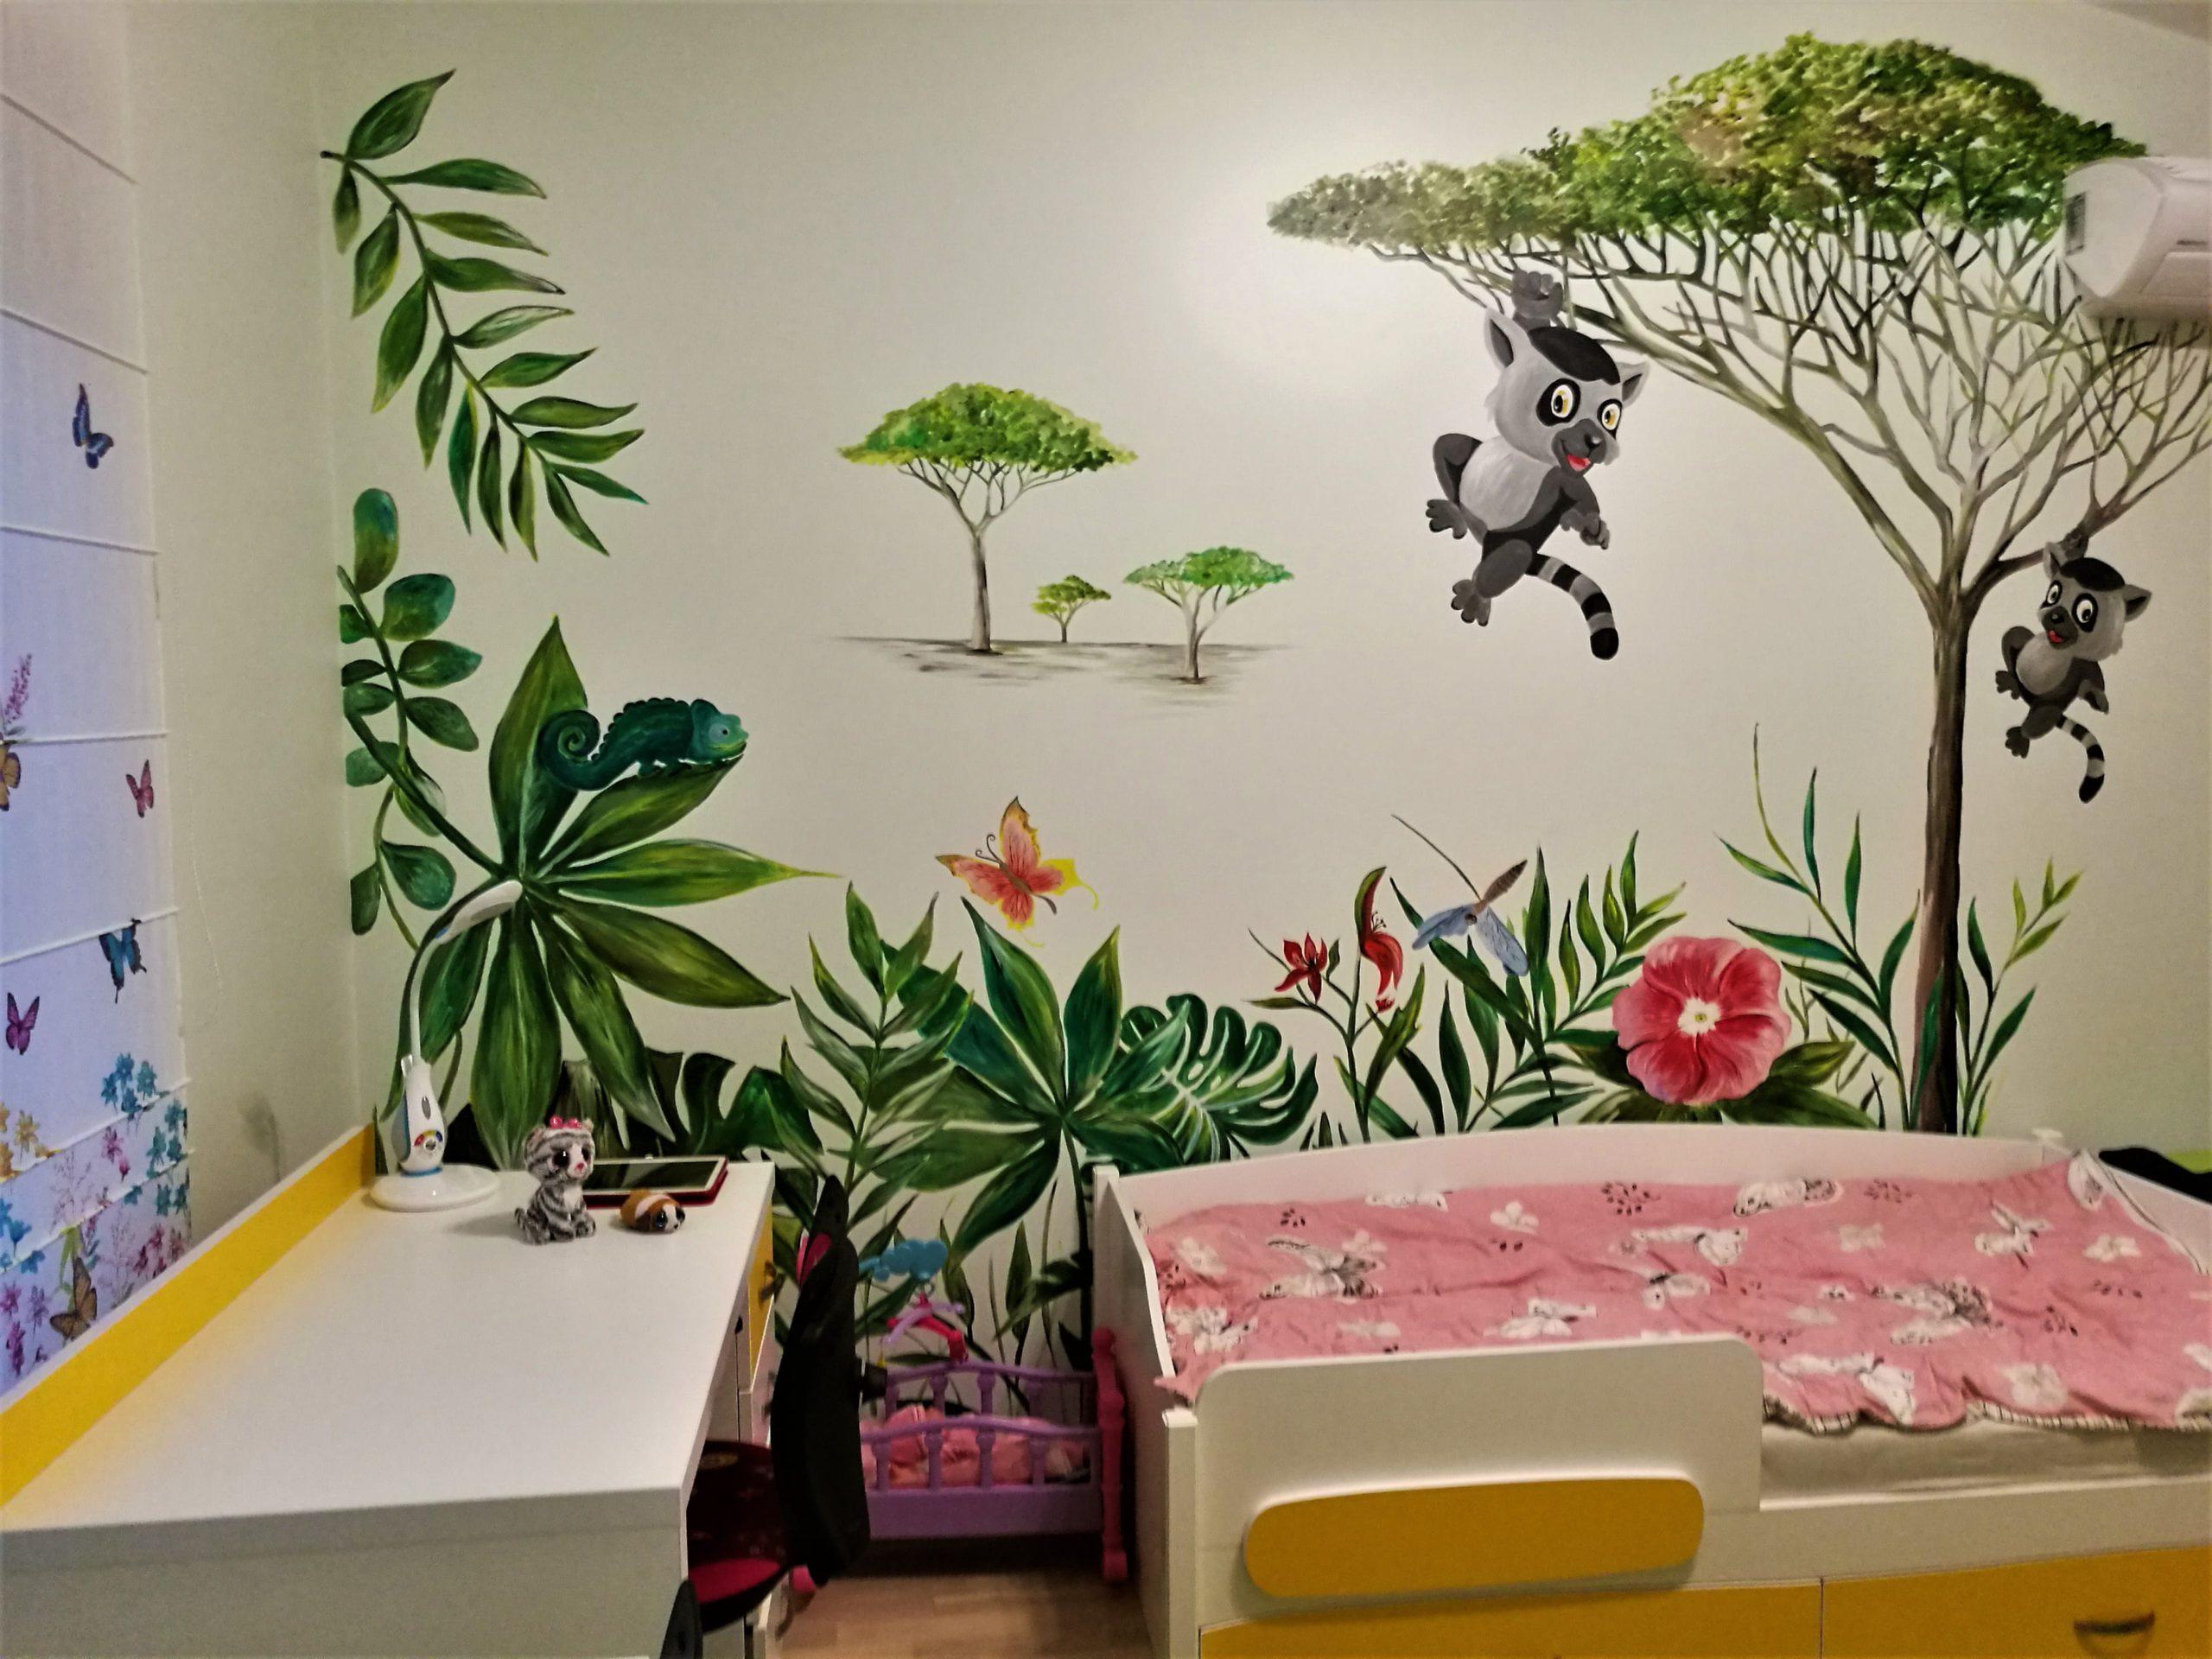 menine-kuryba-sienu-dekoravimas (30)